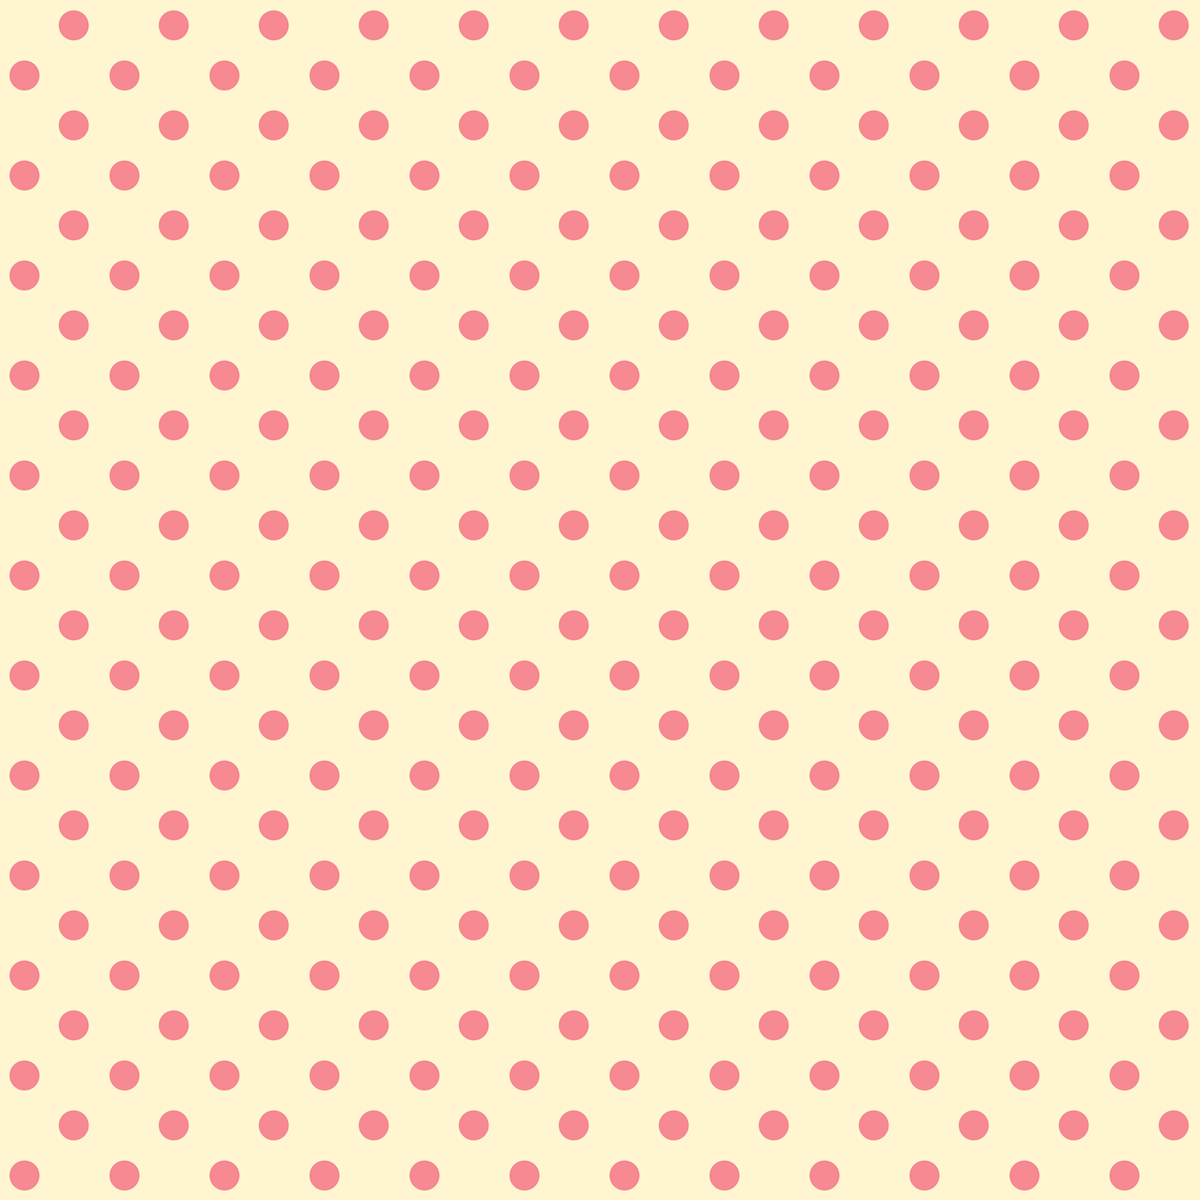 Free Polka Dot, Download Free Clip Art, Free Clip Art On Clipart Library - Free Printable Pink Polka Dot Paper